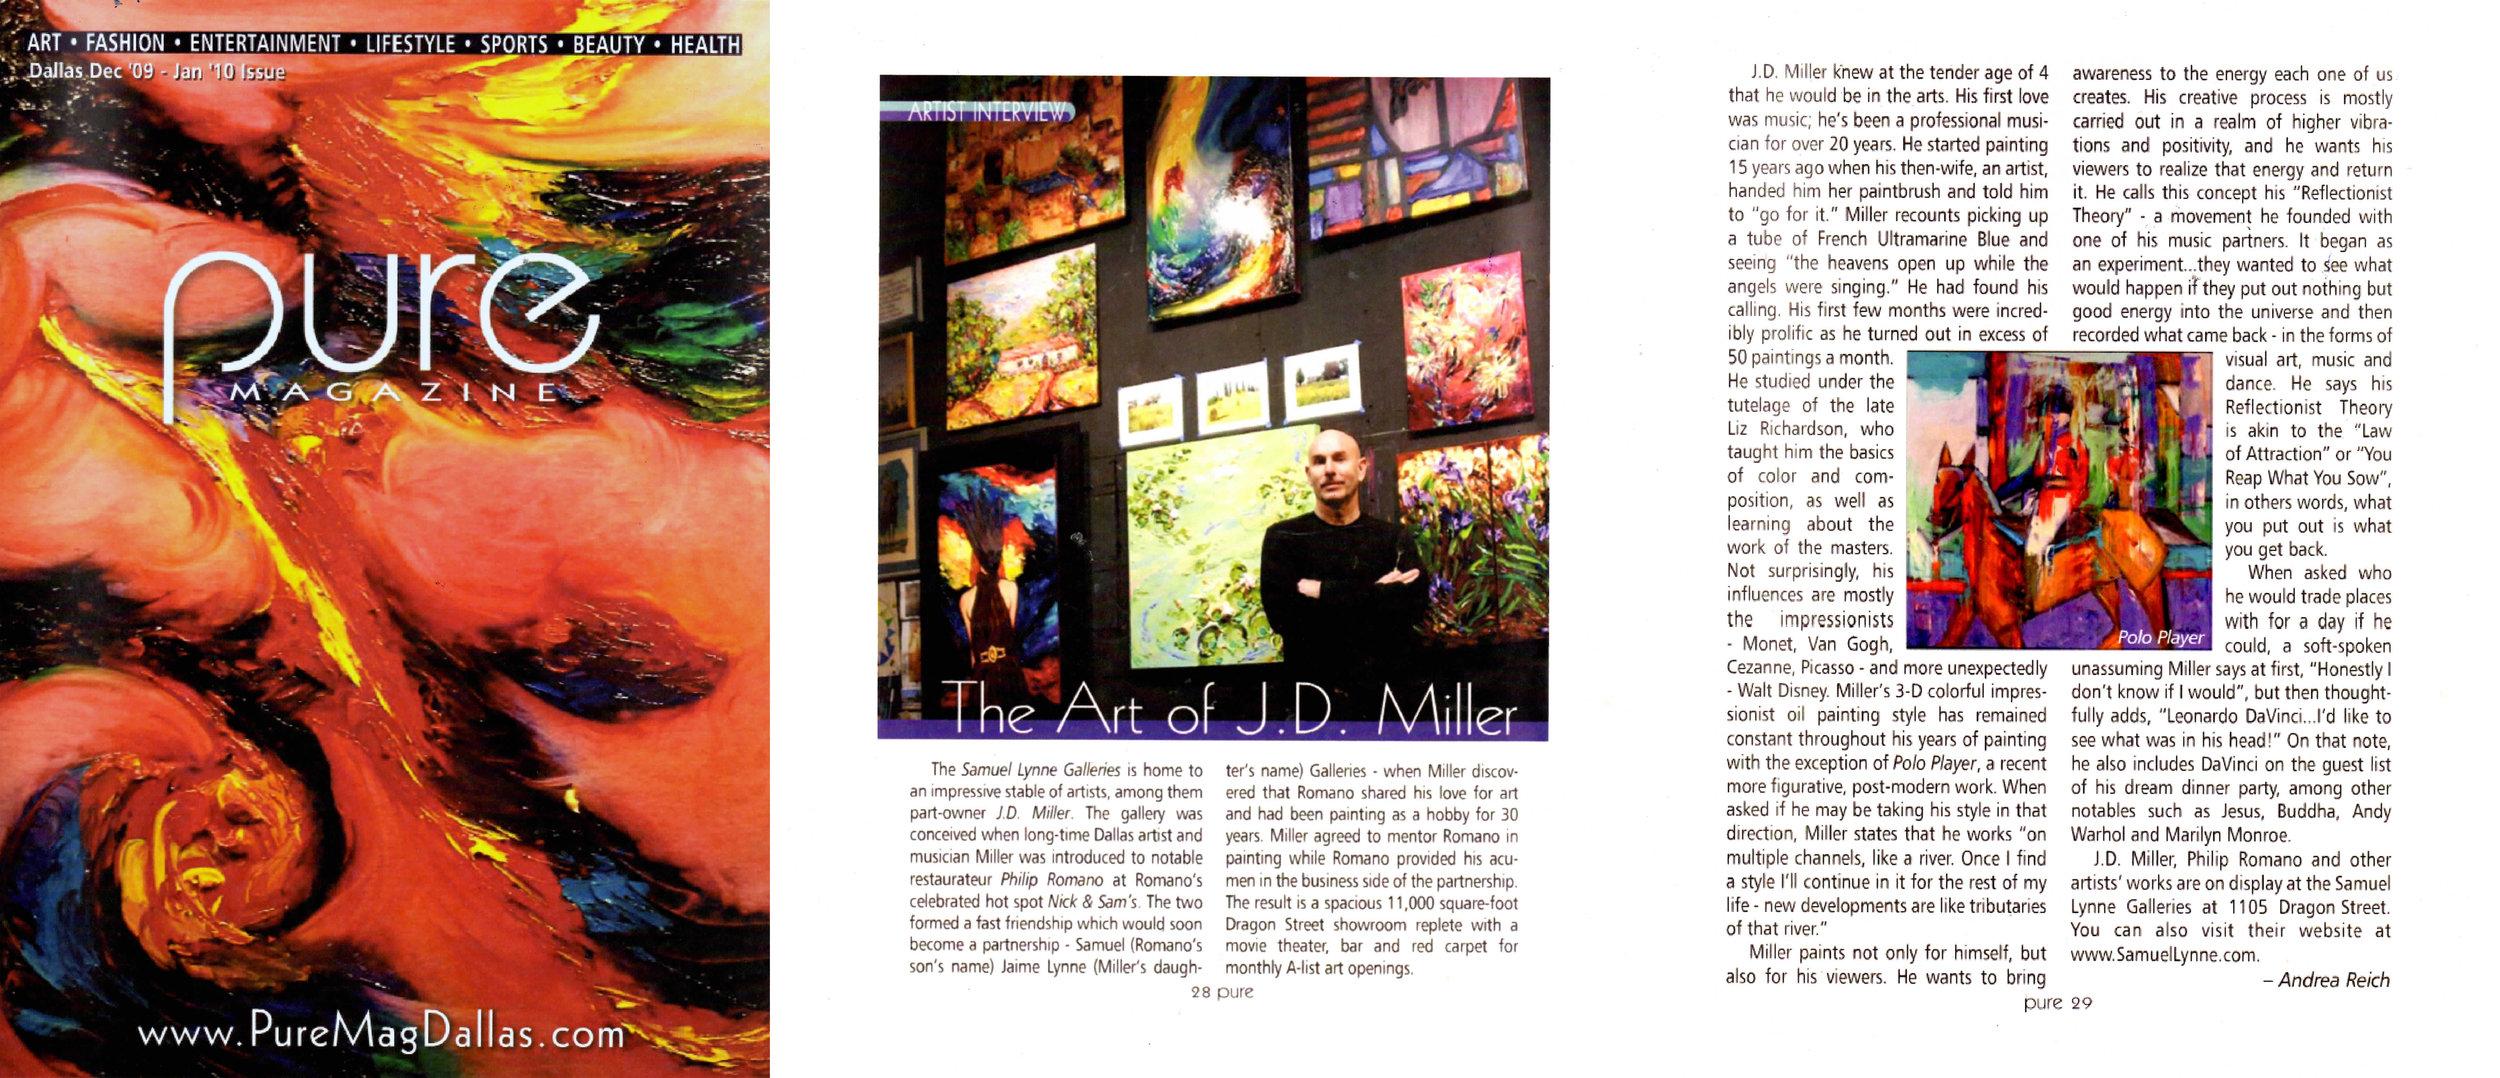 PURE MAGAZINE-Dec 2009-Jan 2010 - The Art of JD Miller.jpg